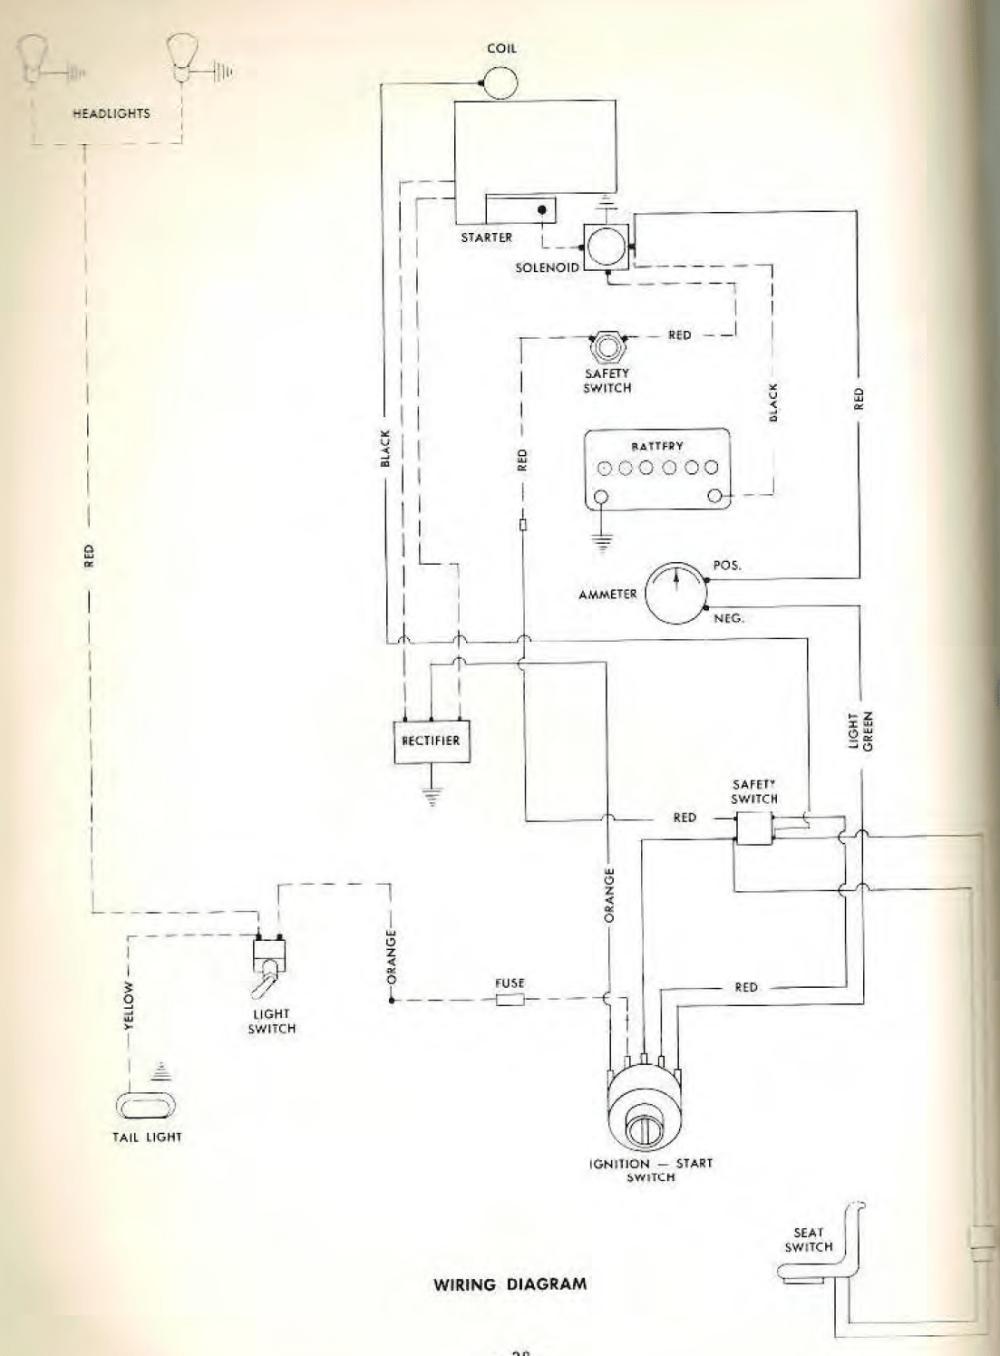 medium resolution of wheel horse wiring diagram wiring diagram show wheel horse c161 wiring diagram wheelhorse wiring diagram